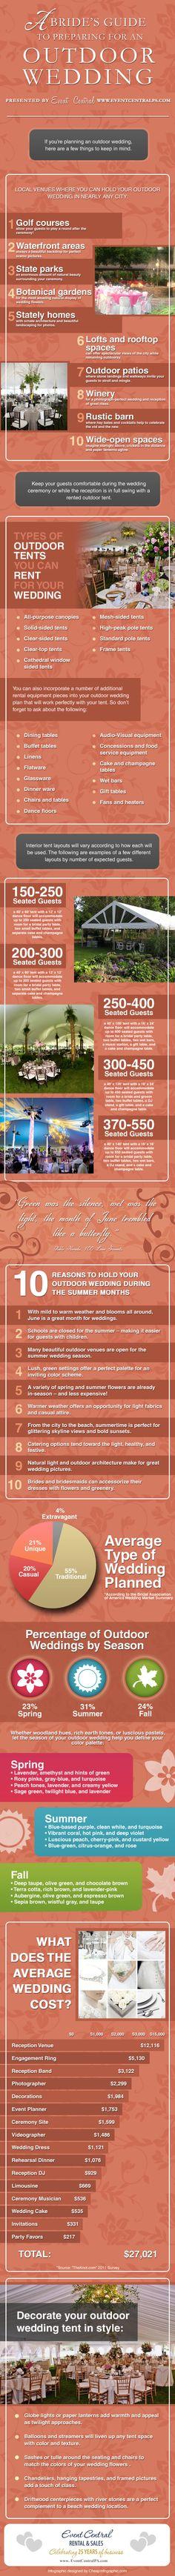 A Bride's Guide to an Outdoor Wedding